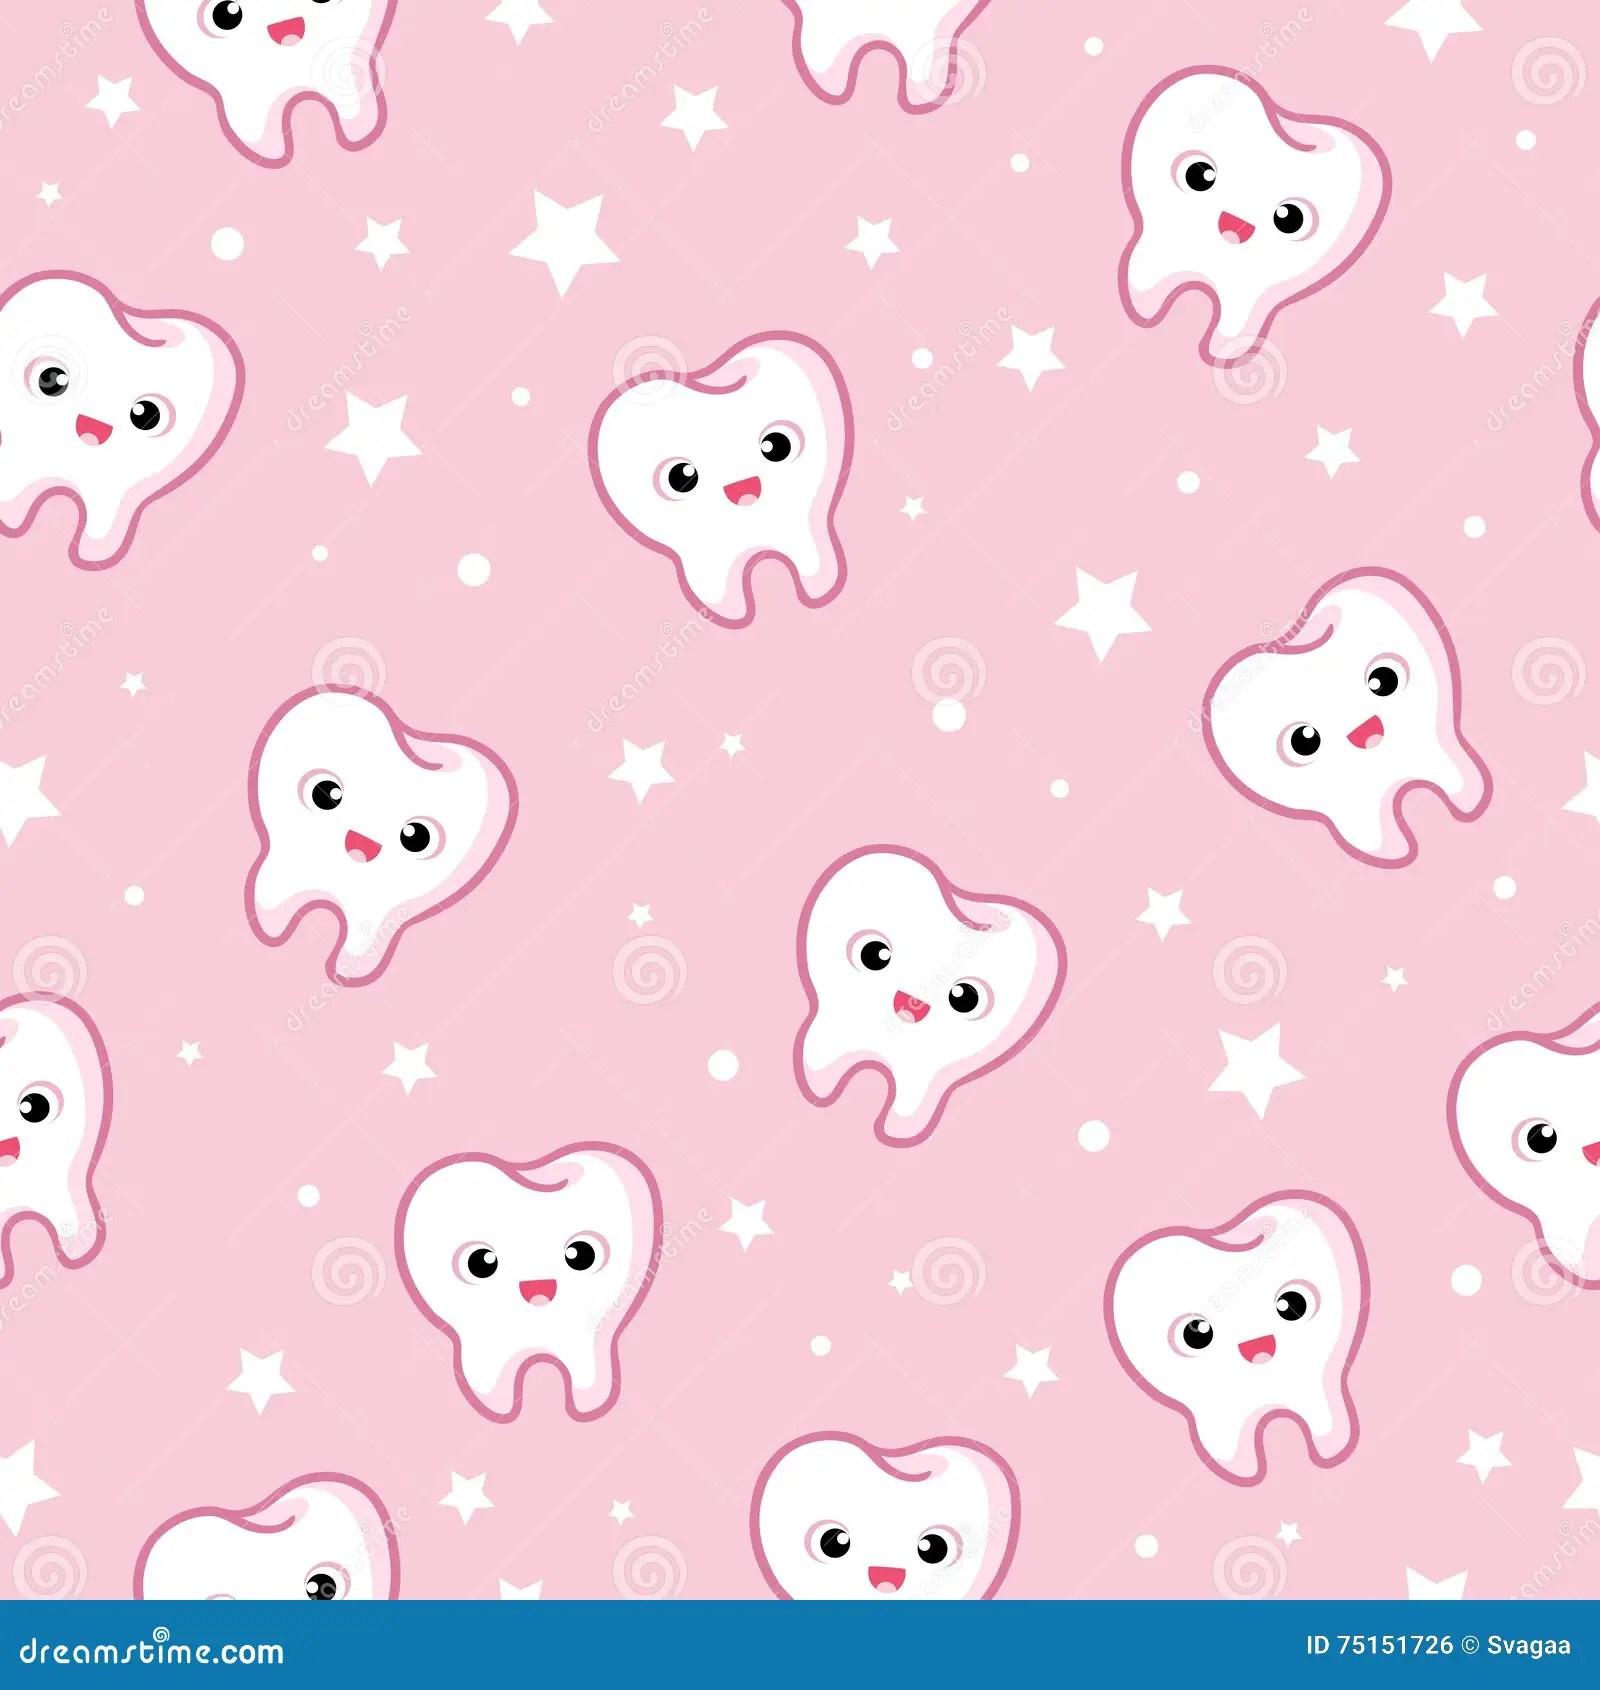 Cute Dental Wallpaper Vector Seamless Illustration With Teeth Stock